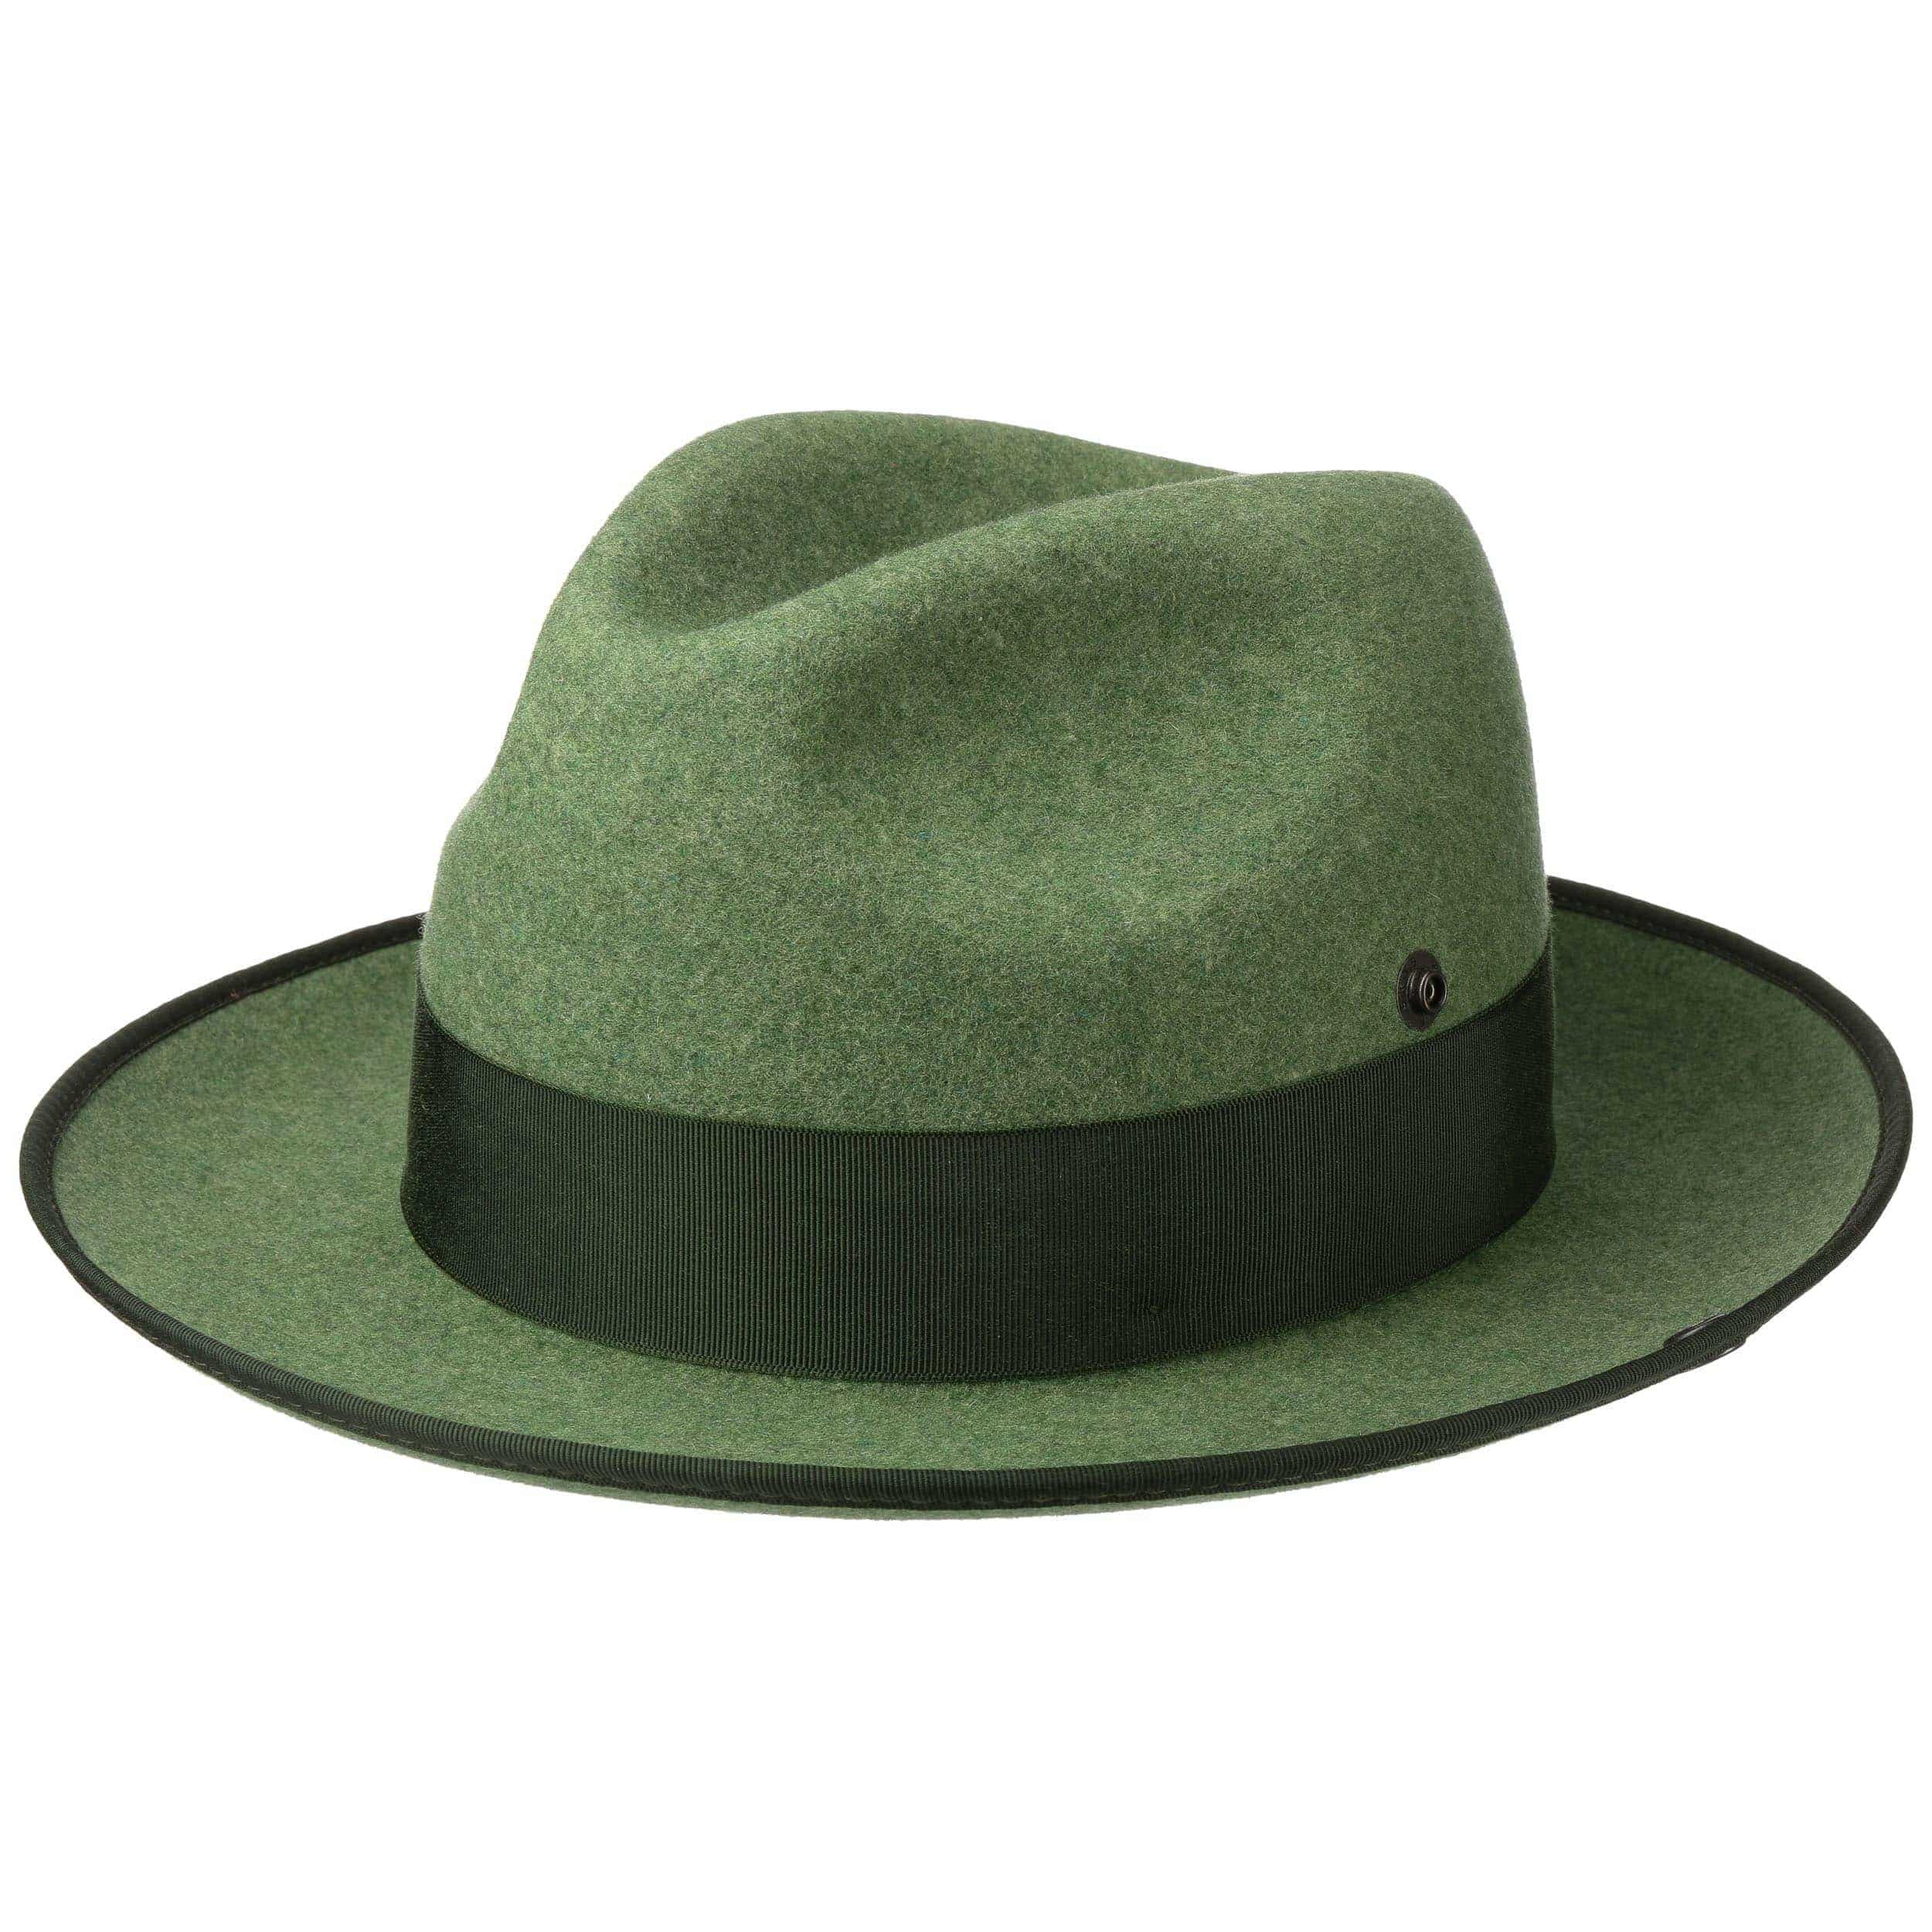 Hunting Hat with Press Stud by Wegener